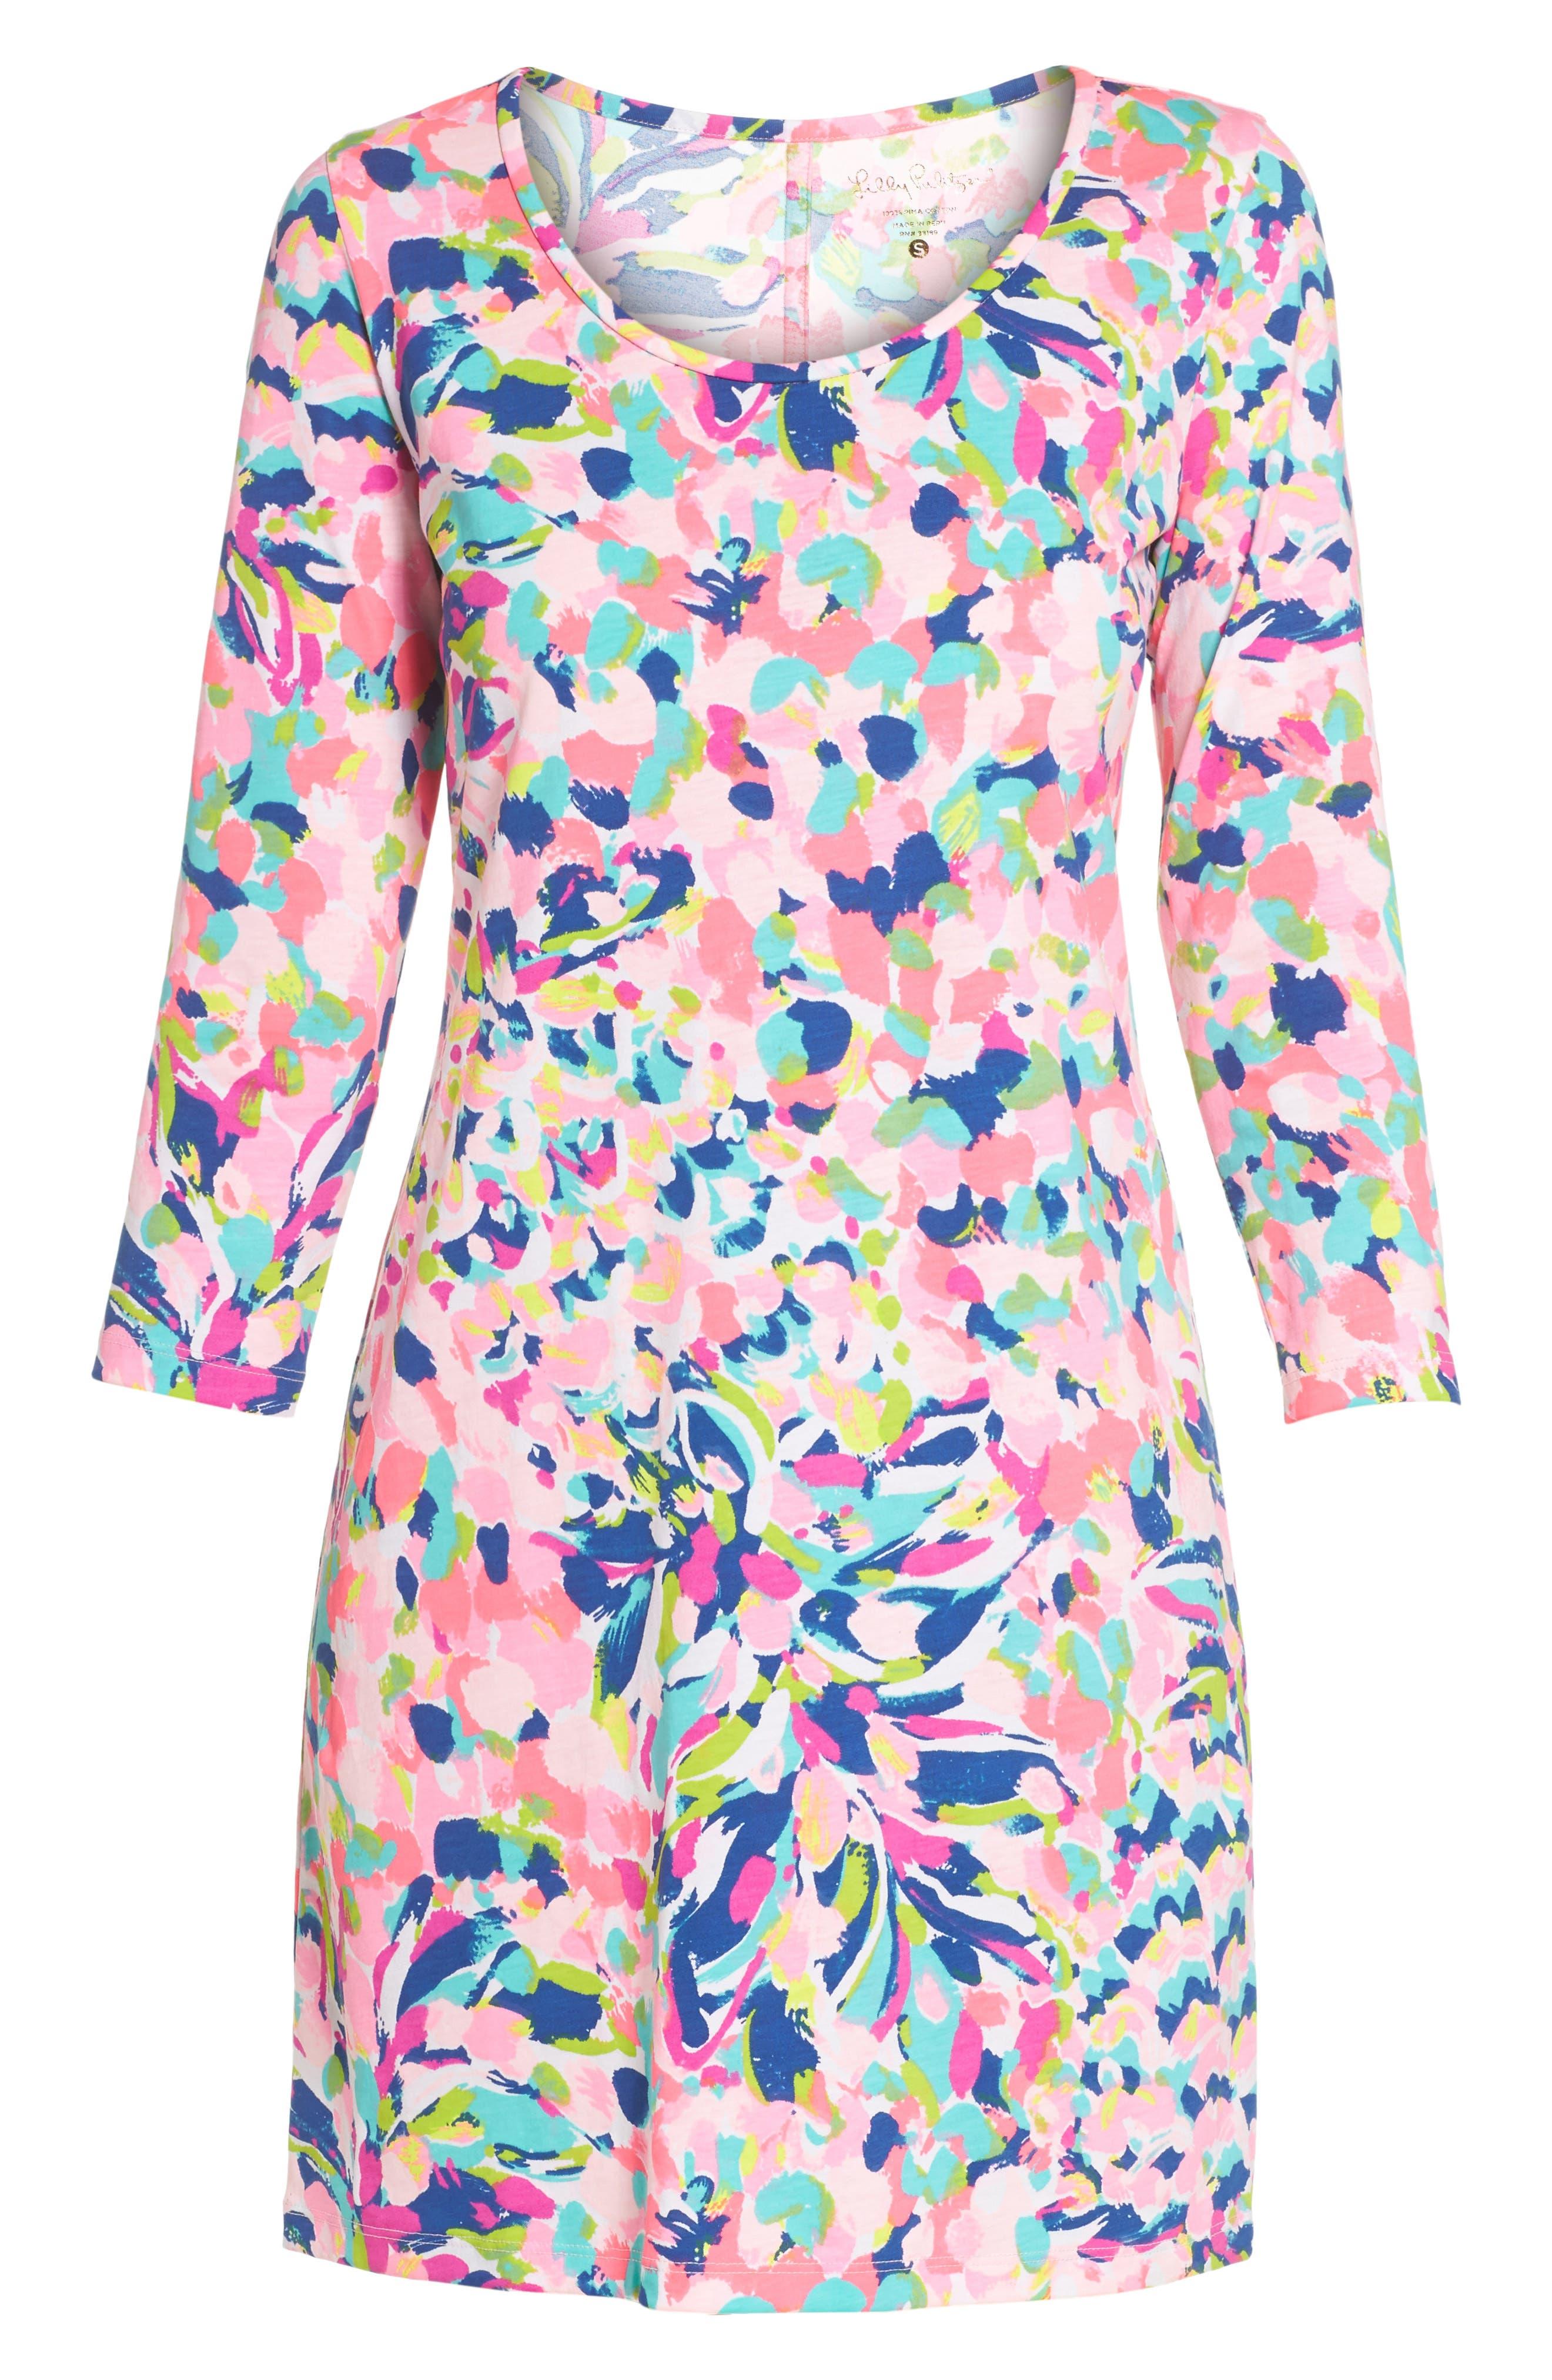 Beacon Shift Dress,                             Alternate thumbnail 6, color,                             Multi Pina Colada Club